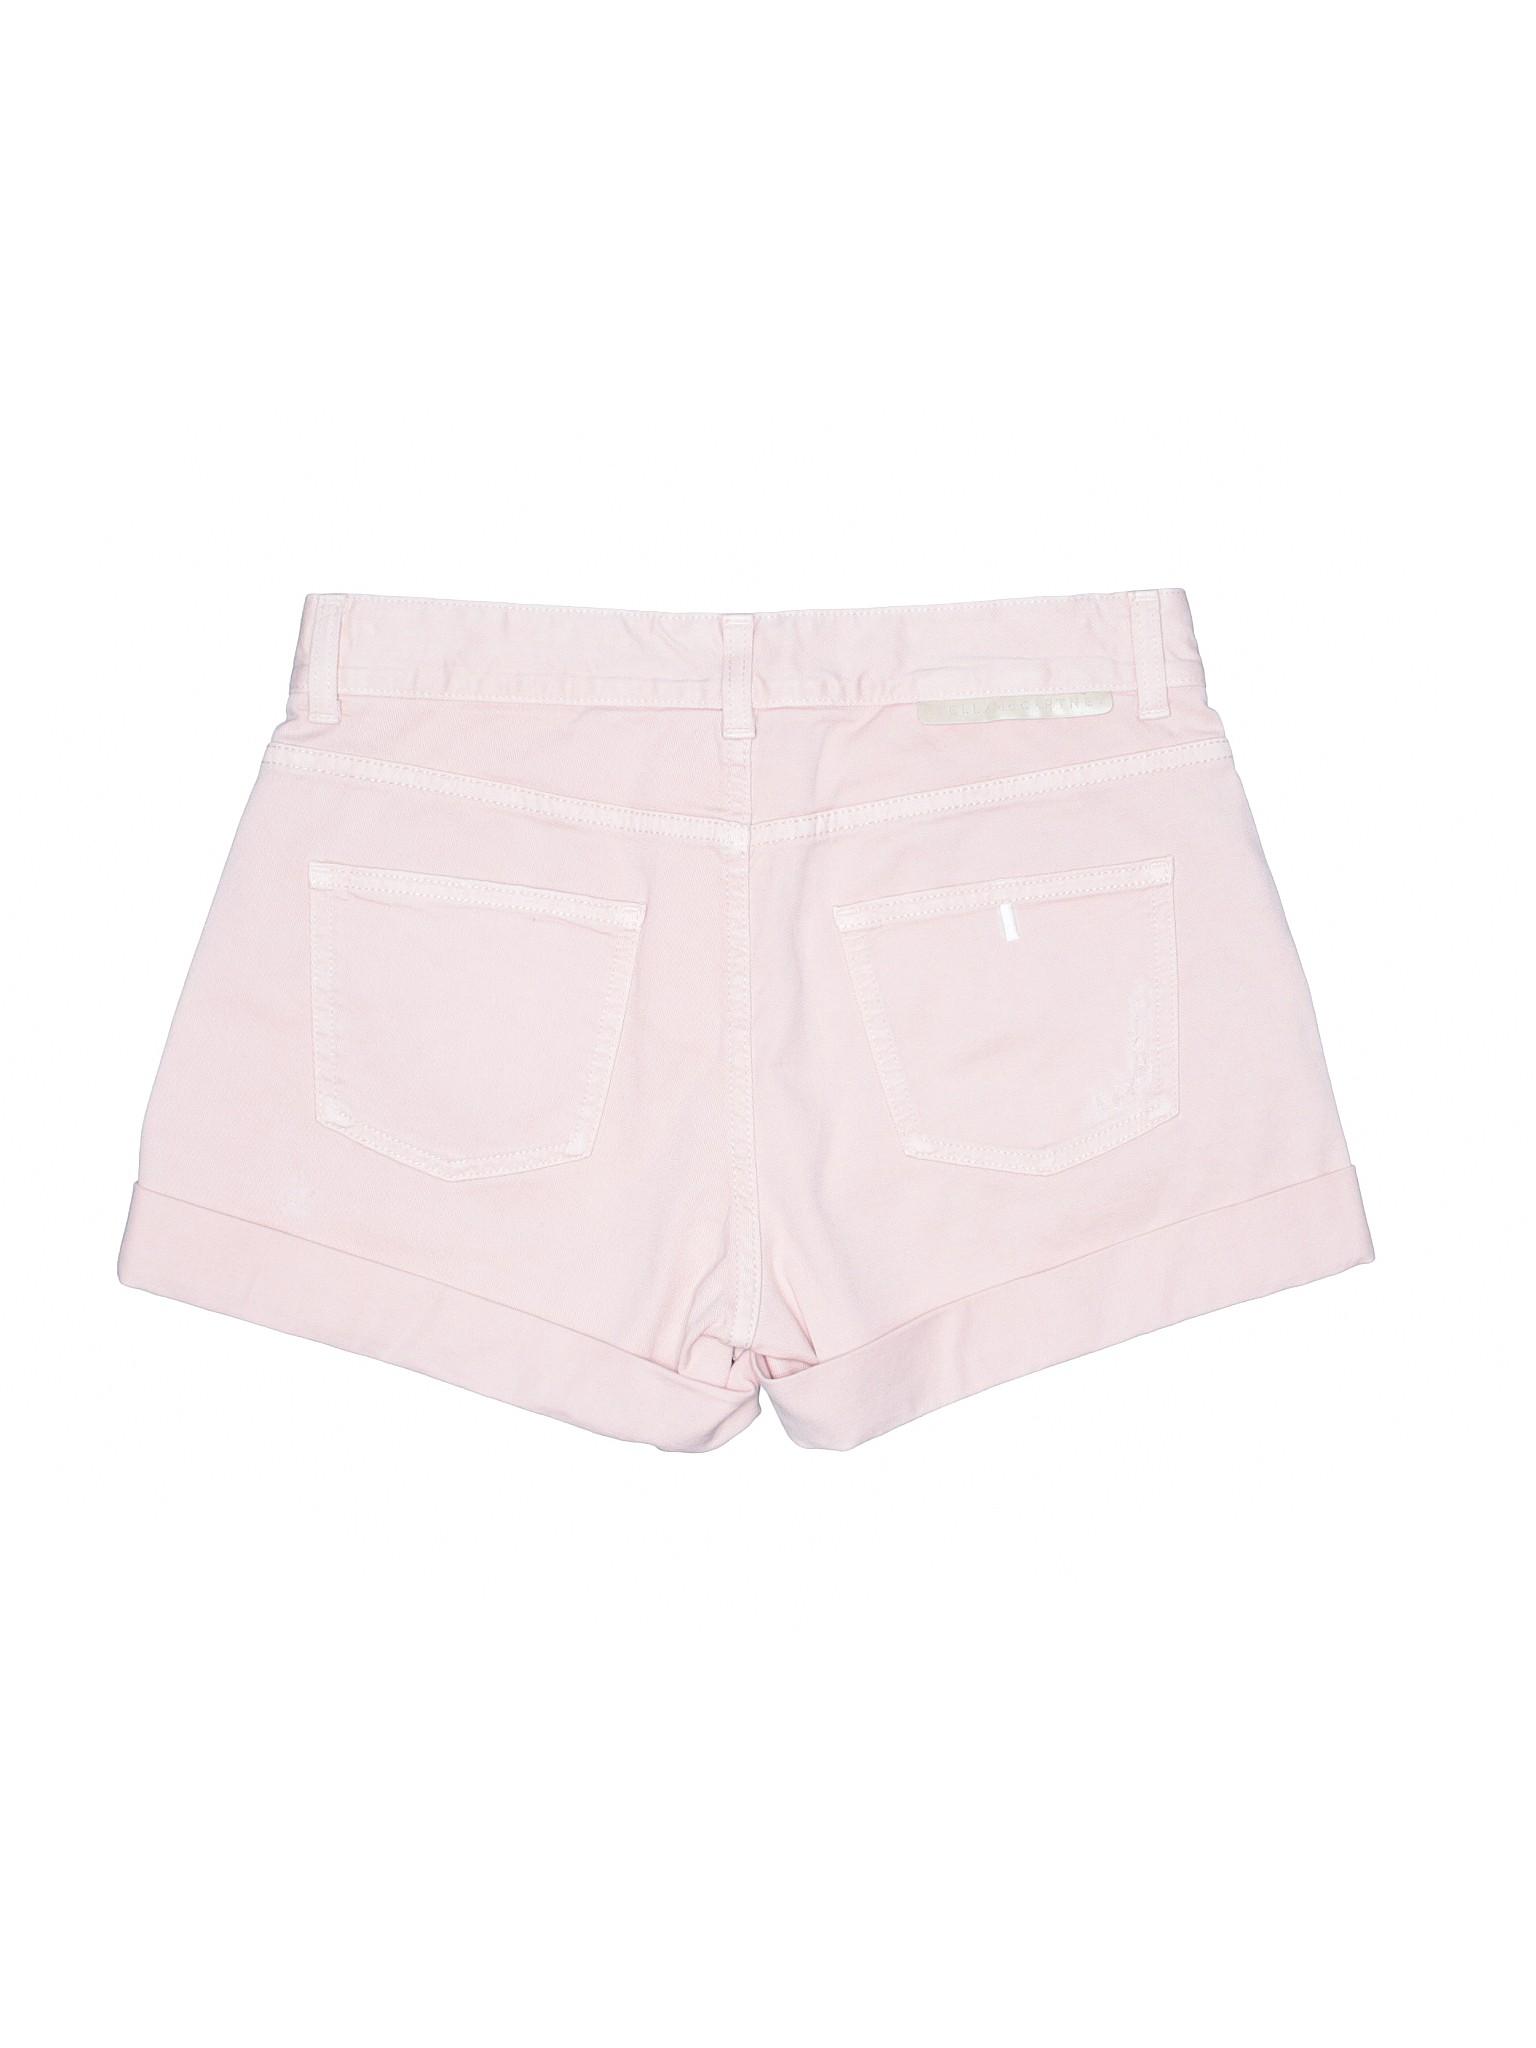 Shorts Boutique McCartney Boutique Denim Denim Boutique Stella McCartney Stella Shorts Stella McCartney Denim X4xwBqZ